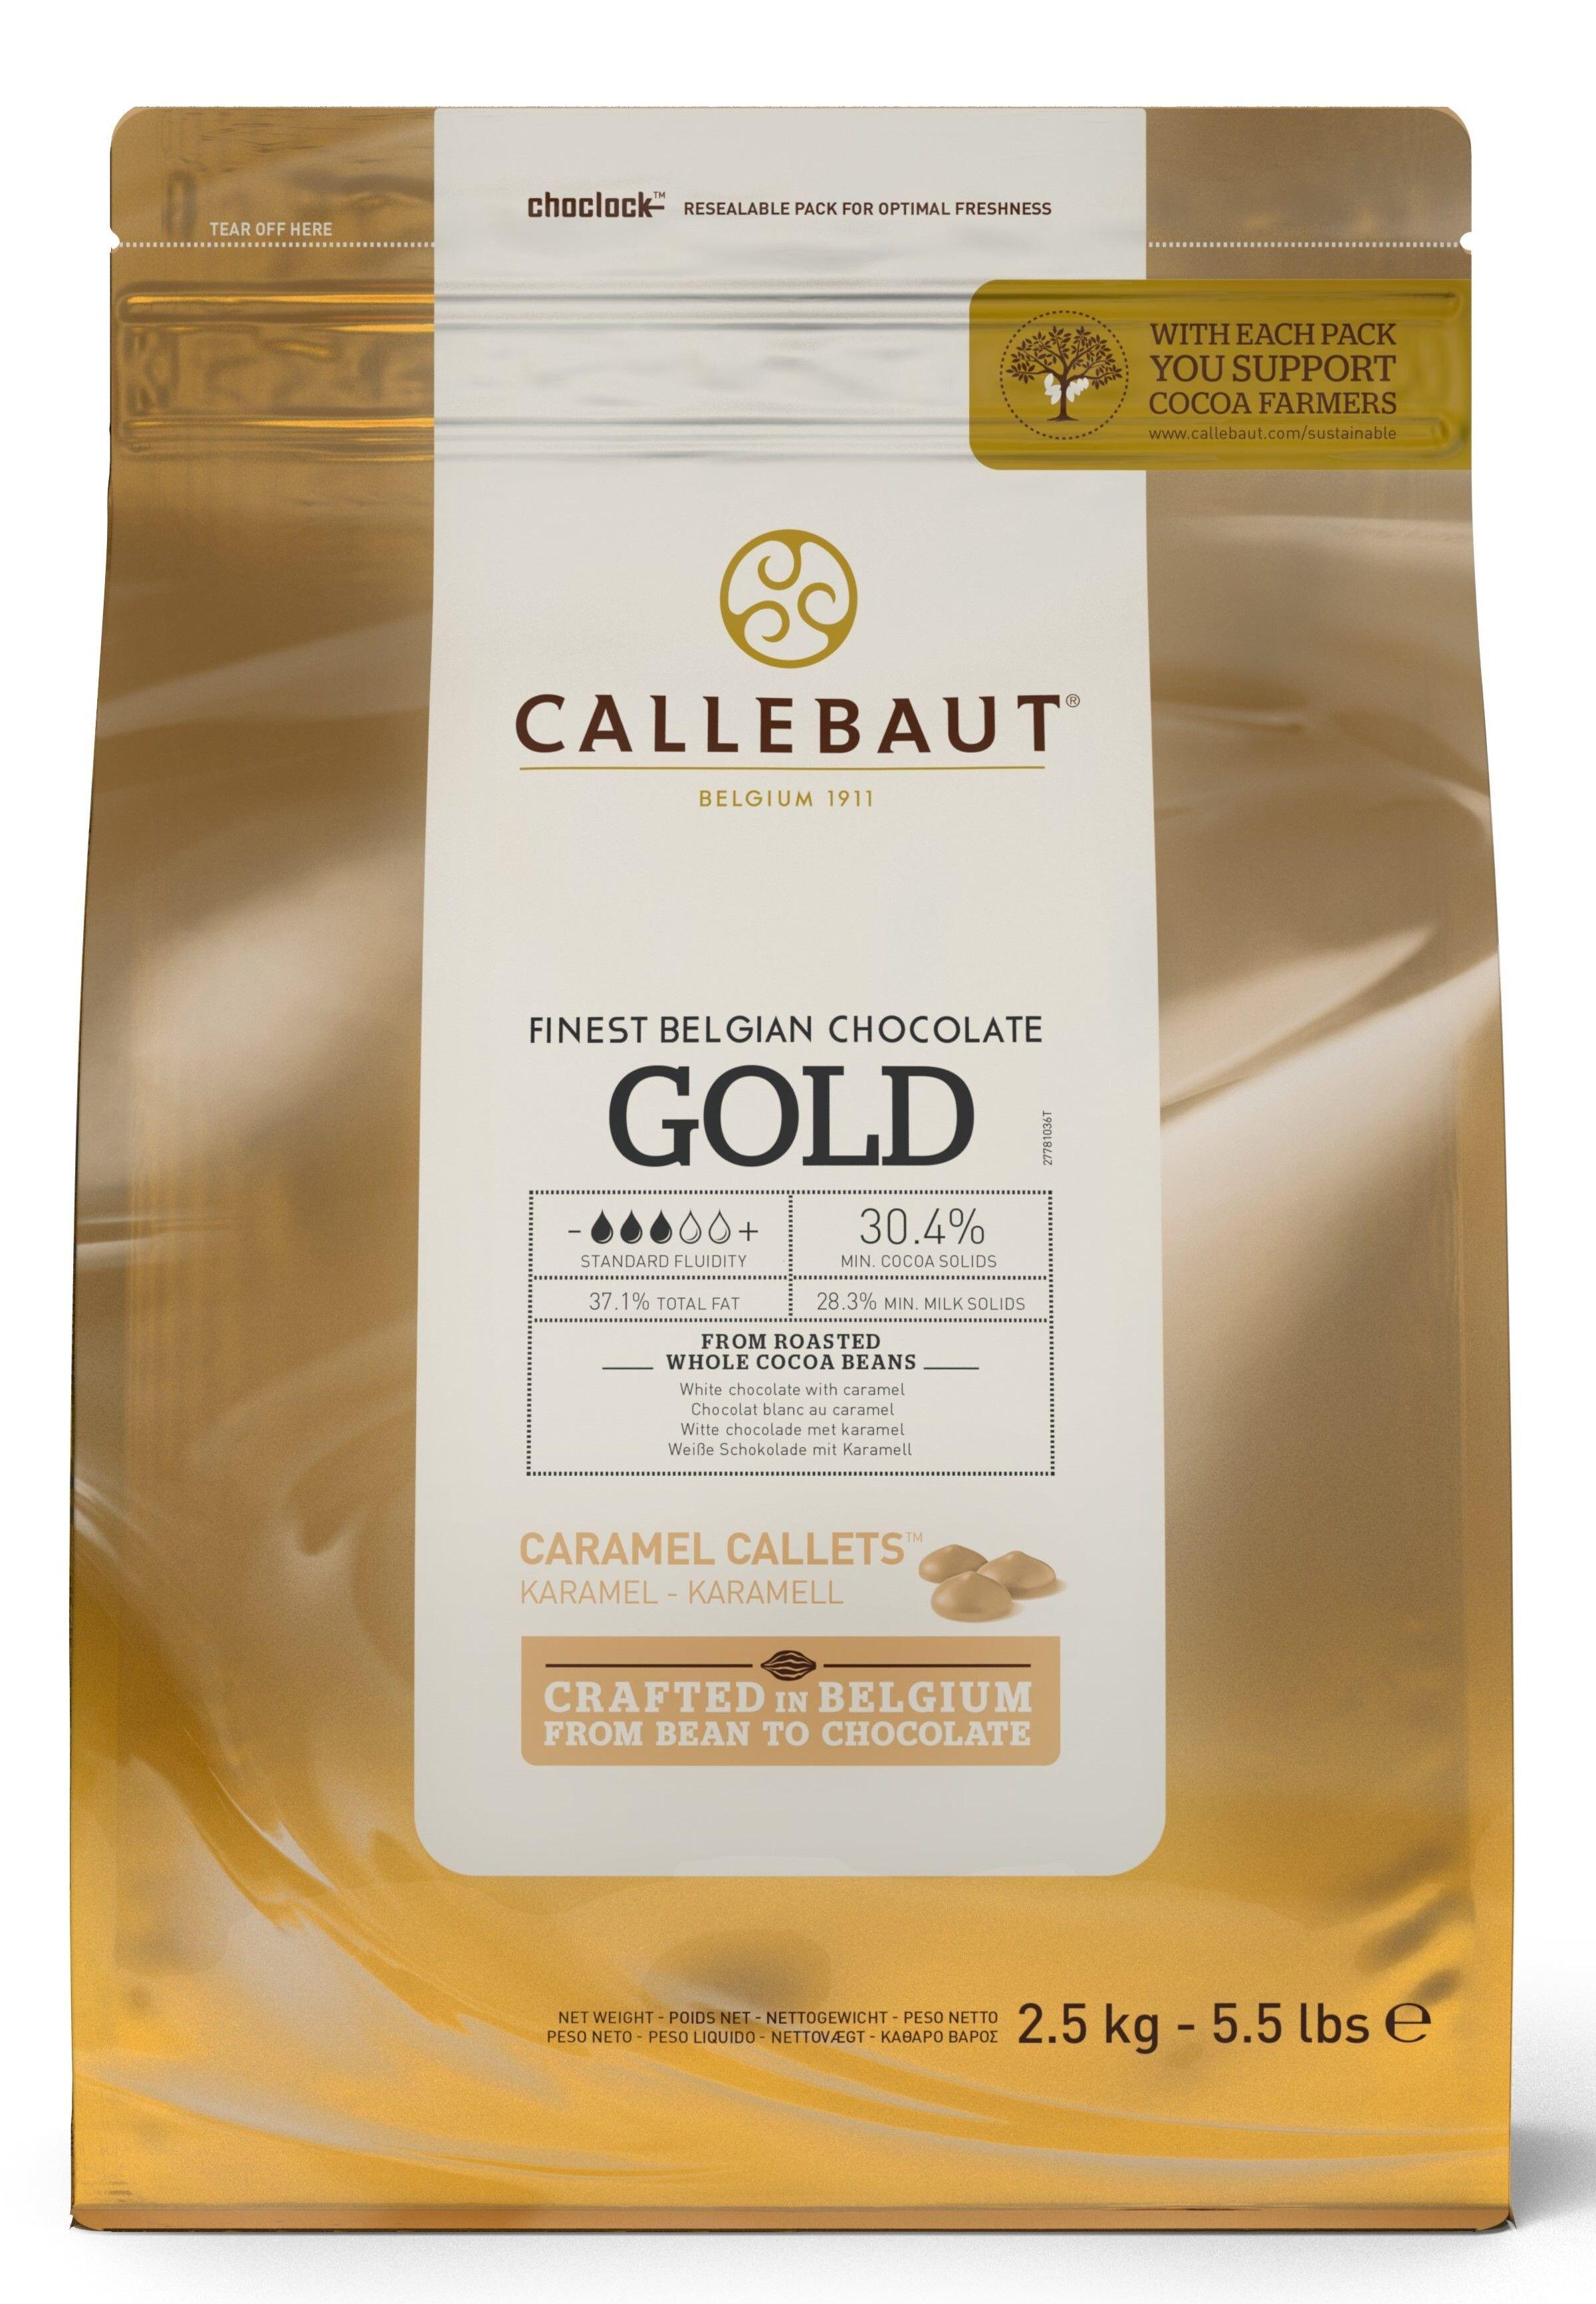 Callebaut Finest Belgian Gold chocolate 2,5kg callets (Chocolade)